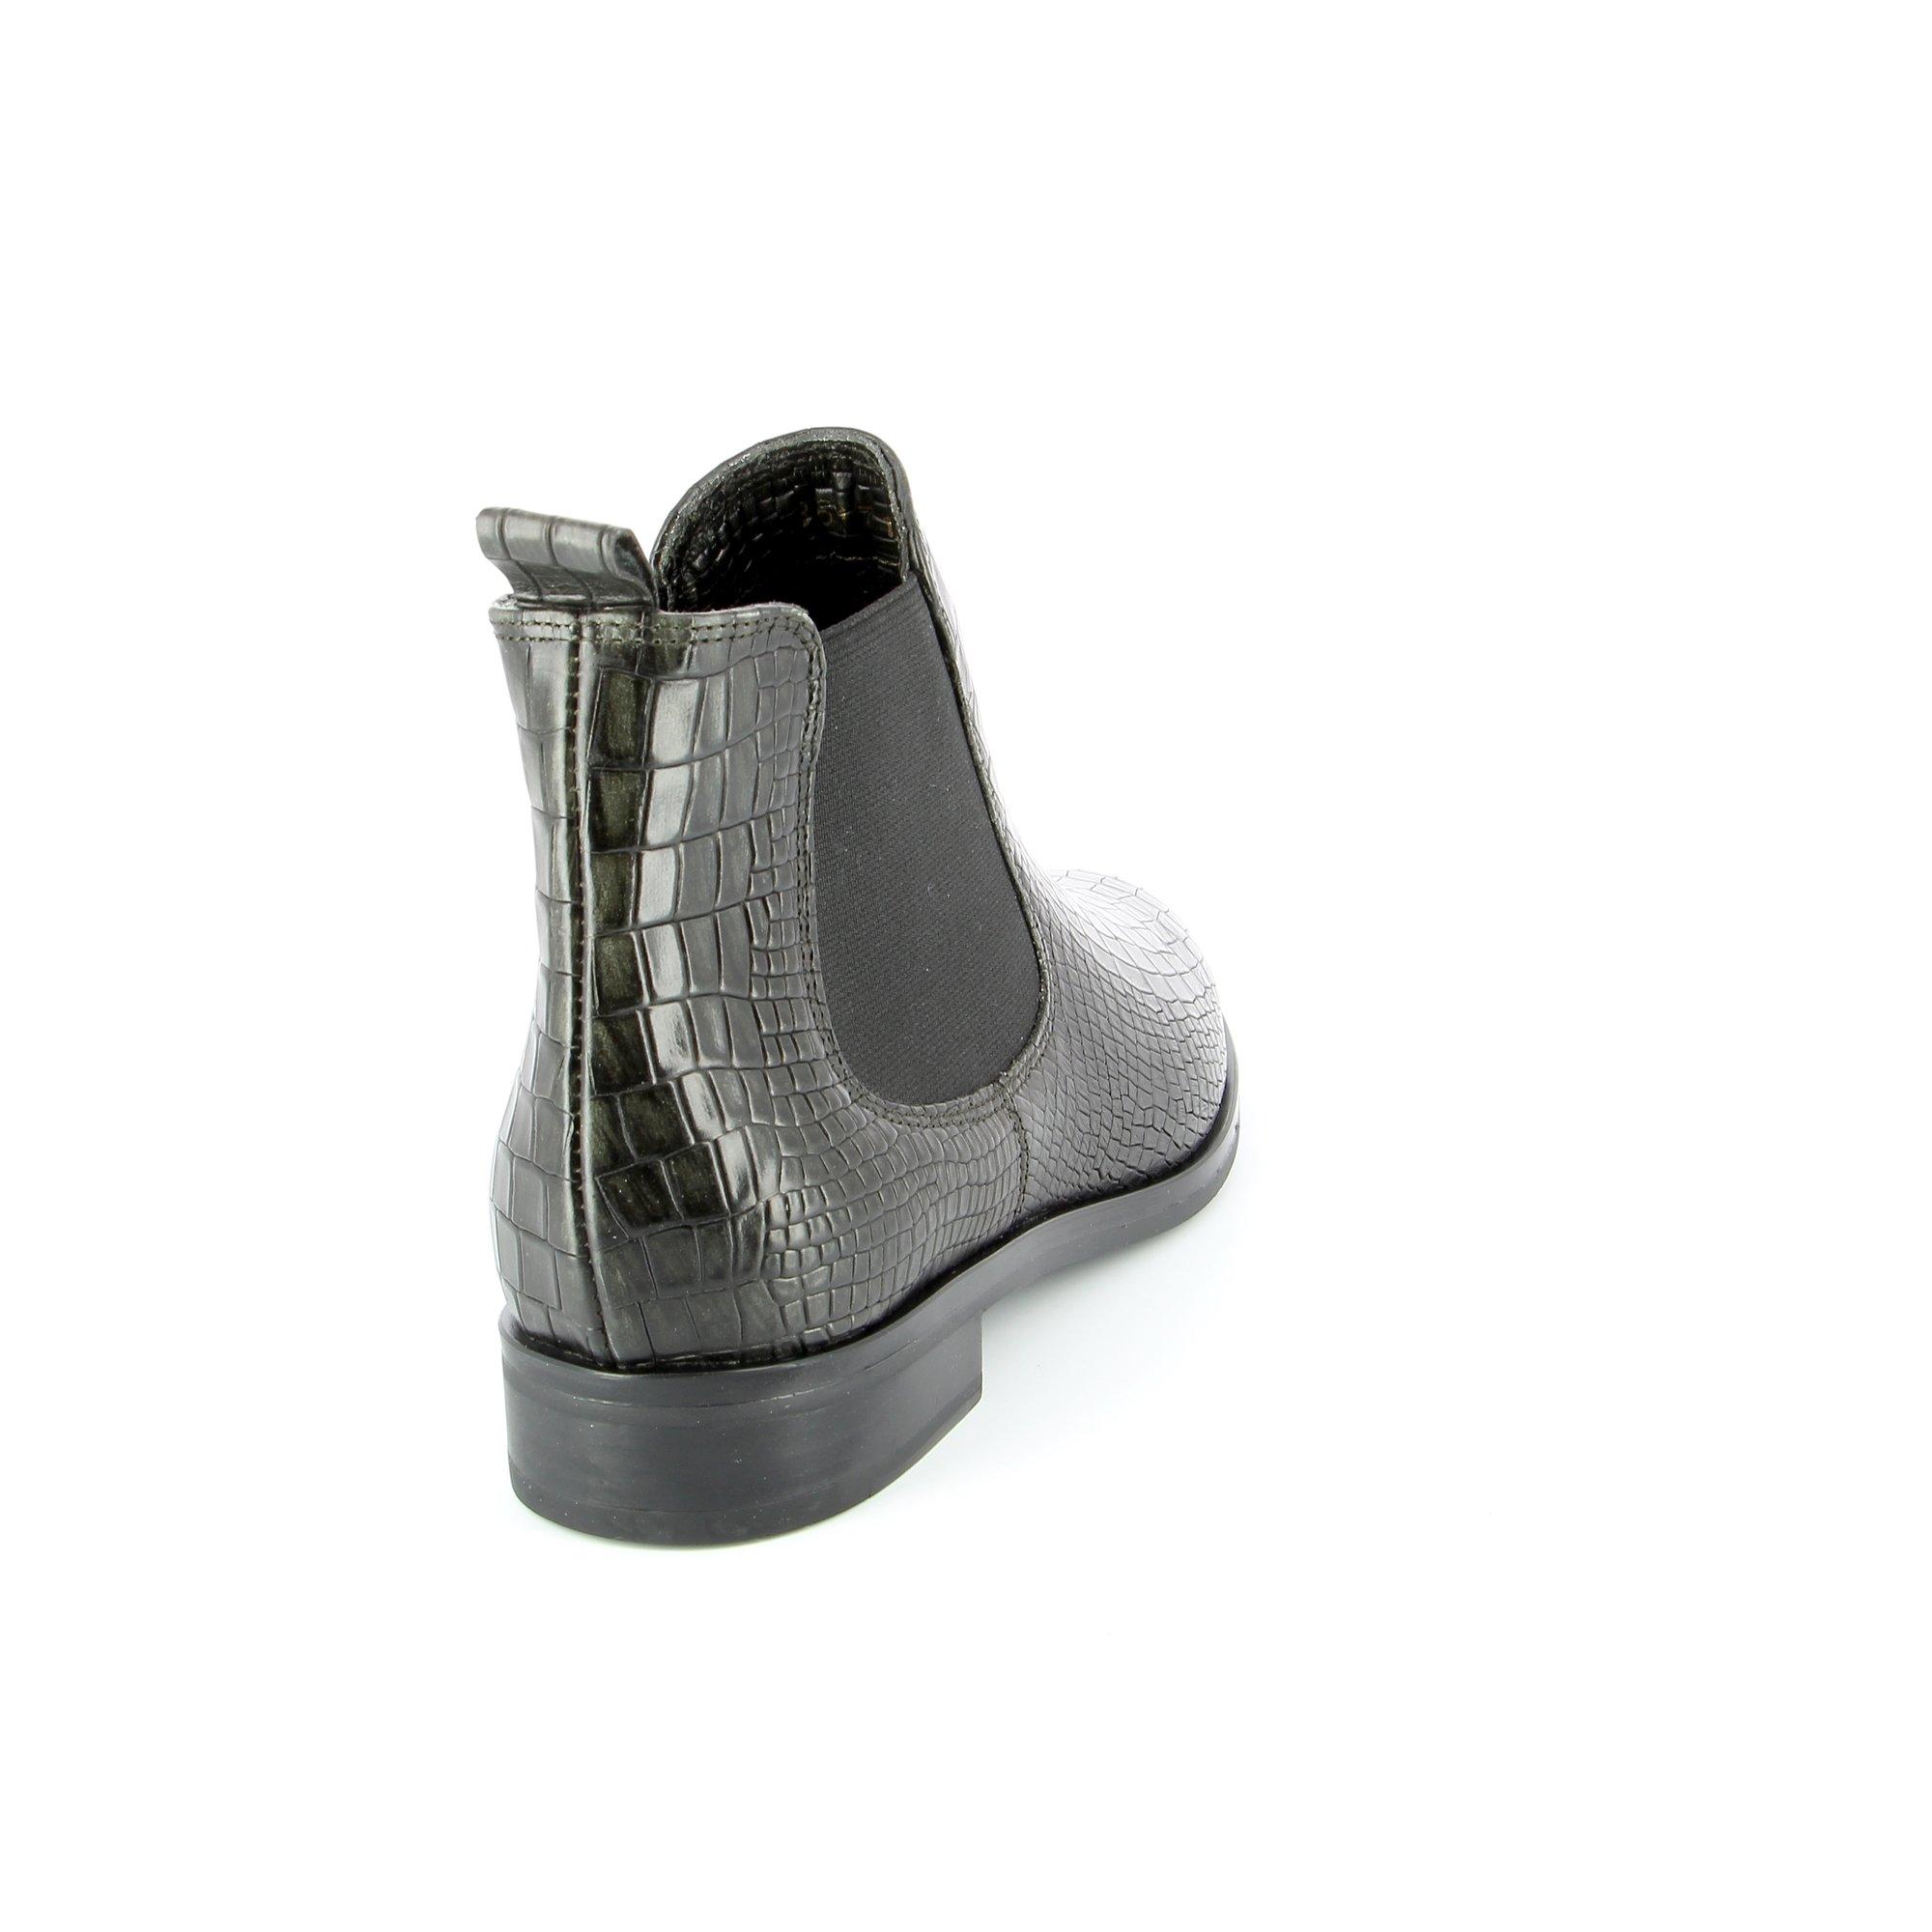 Di Lauro Boots groen